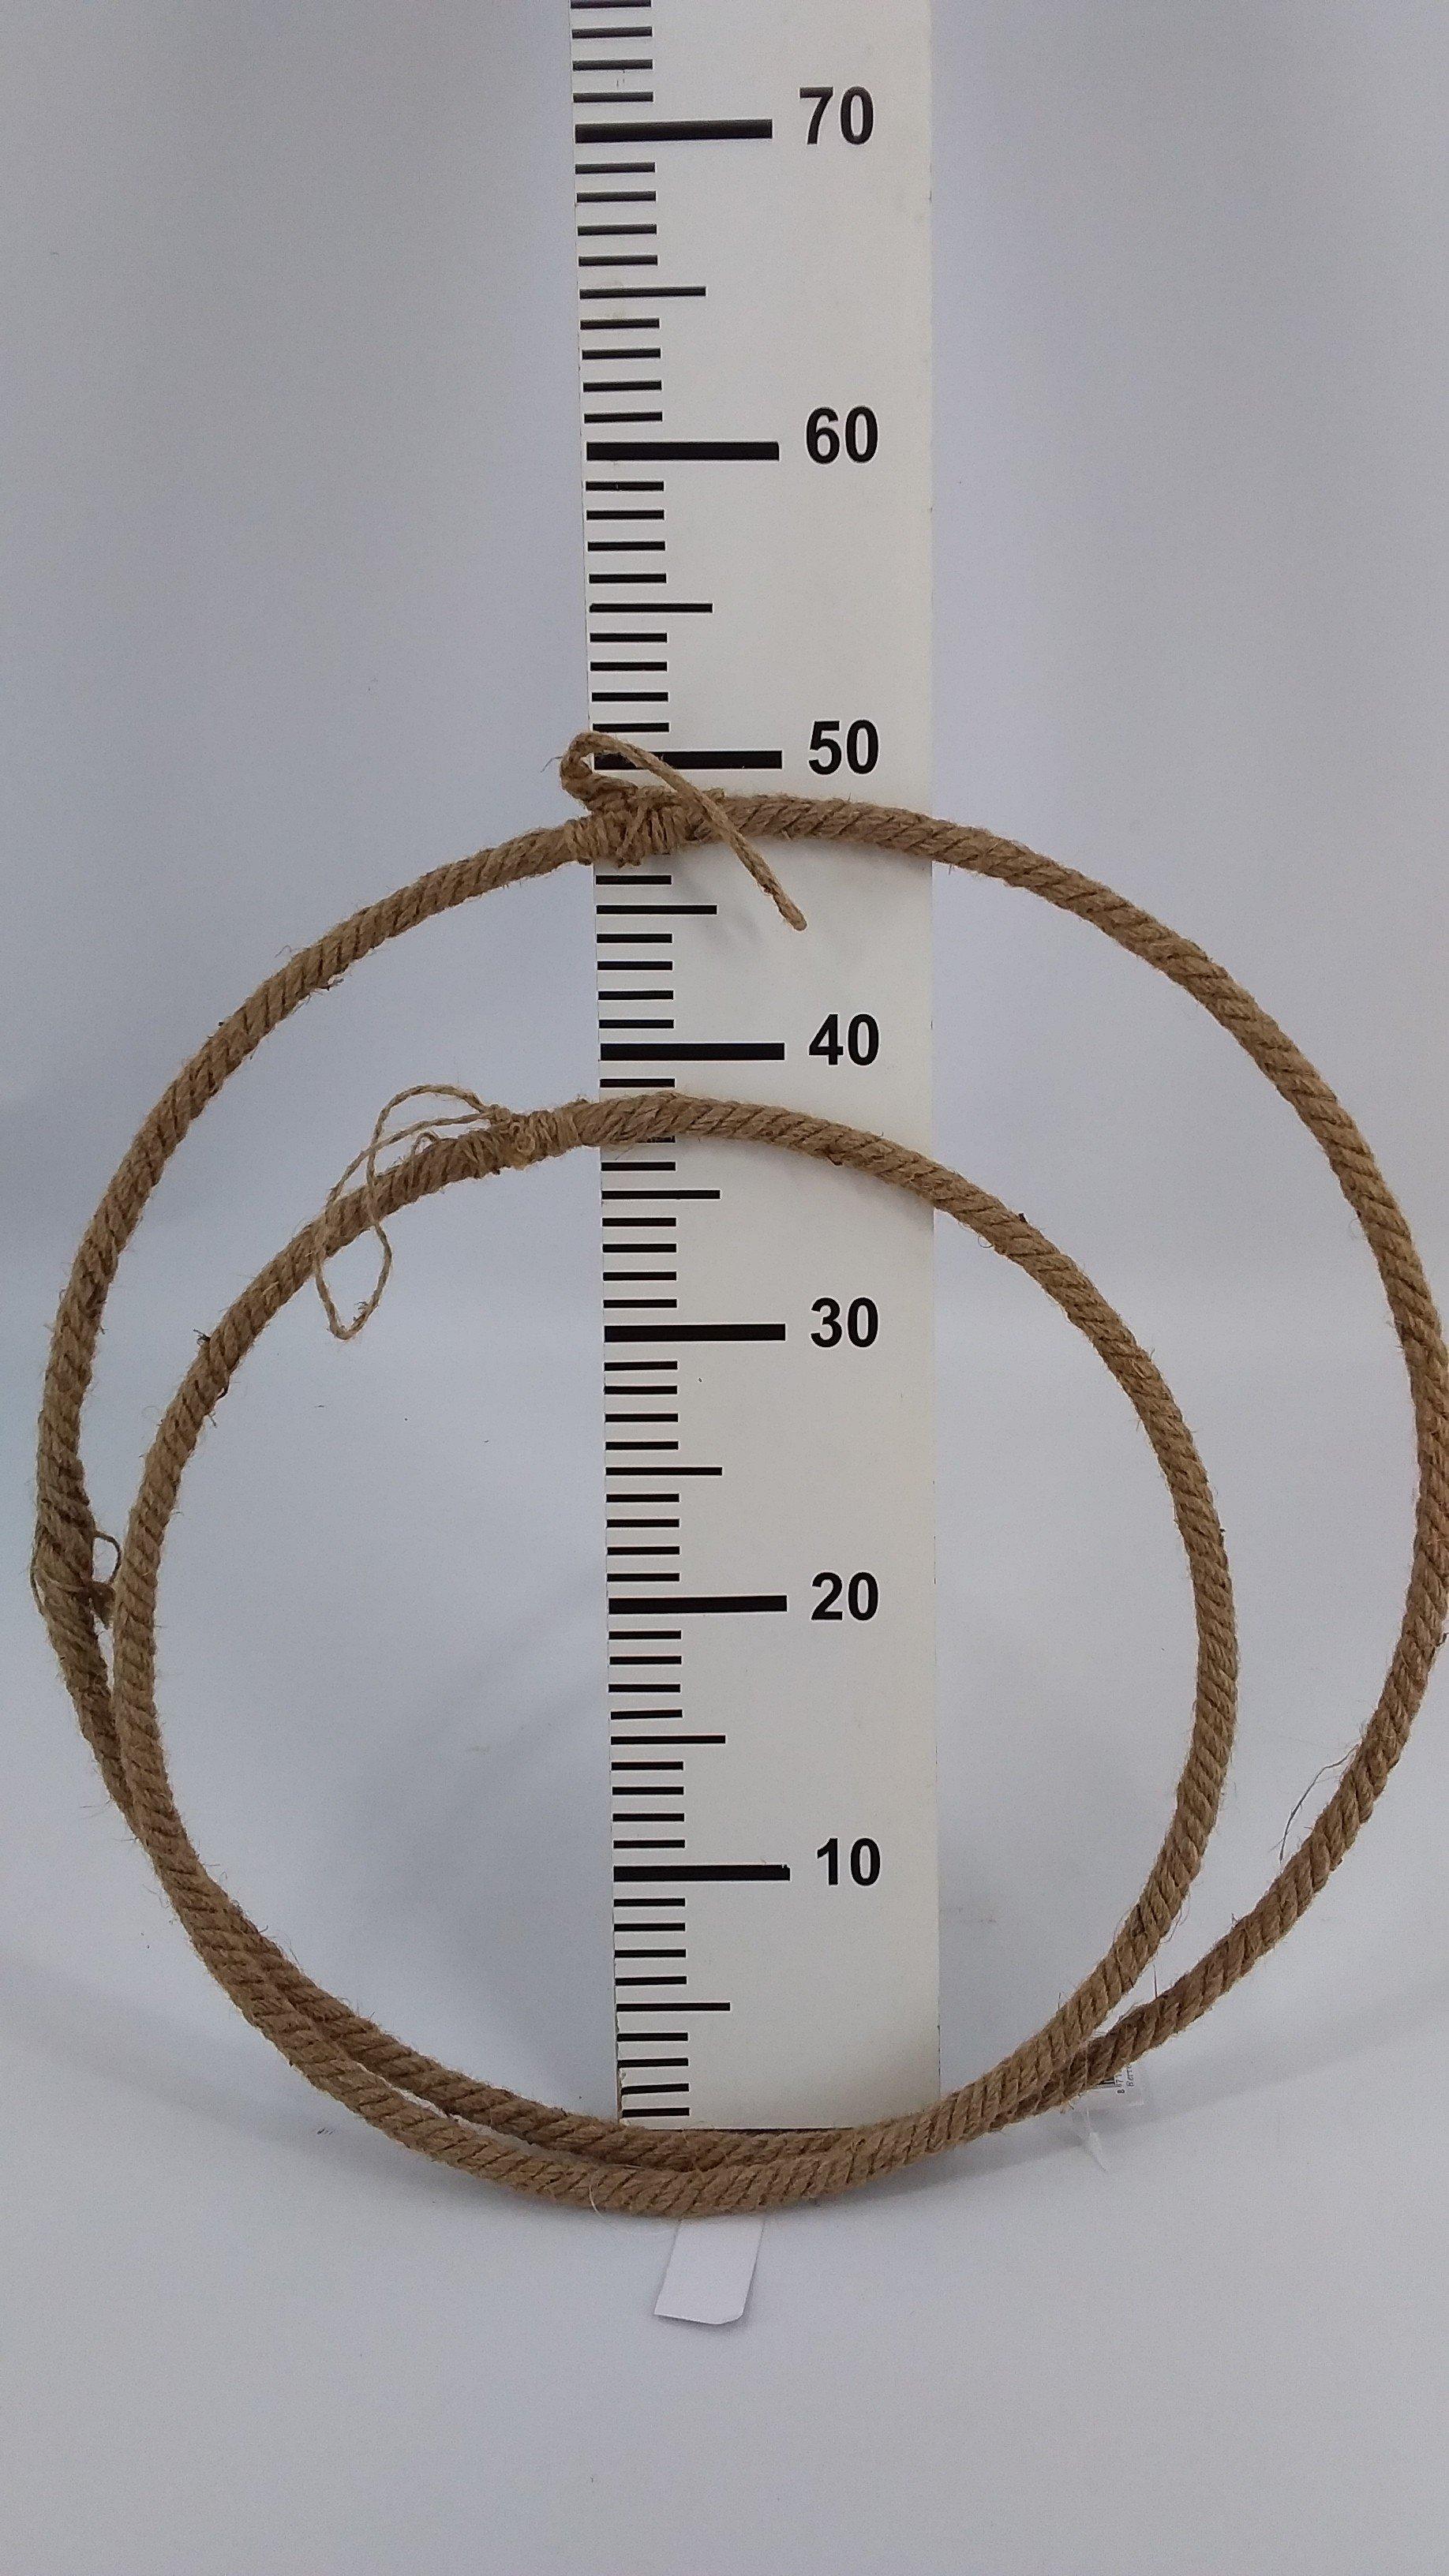 Rope ring 40cm